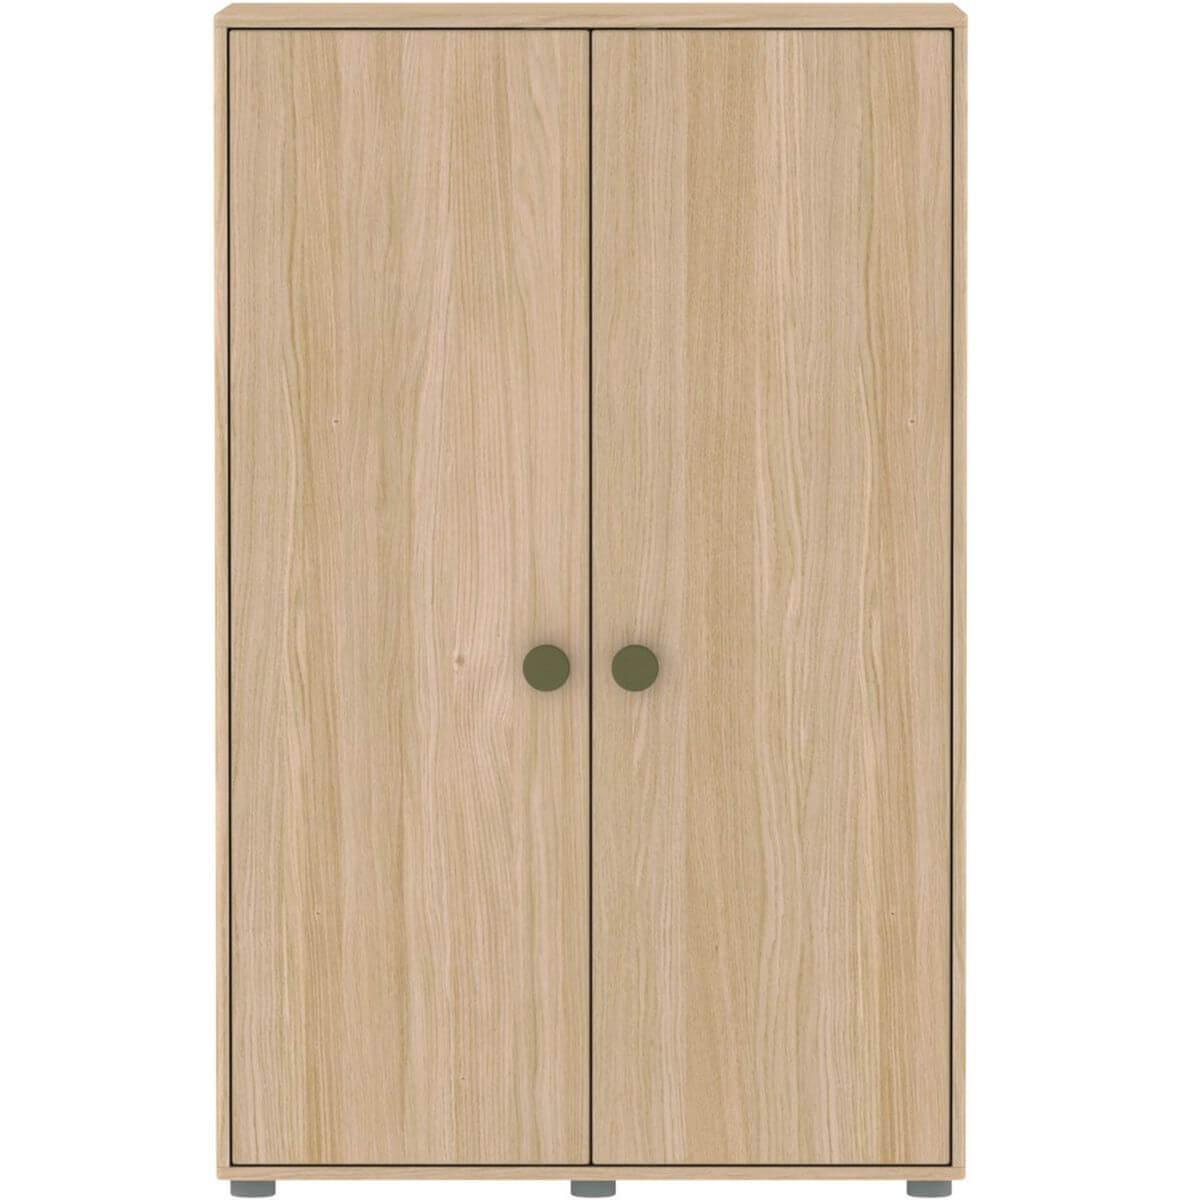 Kleiderschrank 2 Türen 138x88cm POPSICLE Flexa Eiche-kiwi